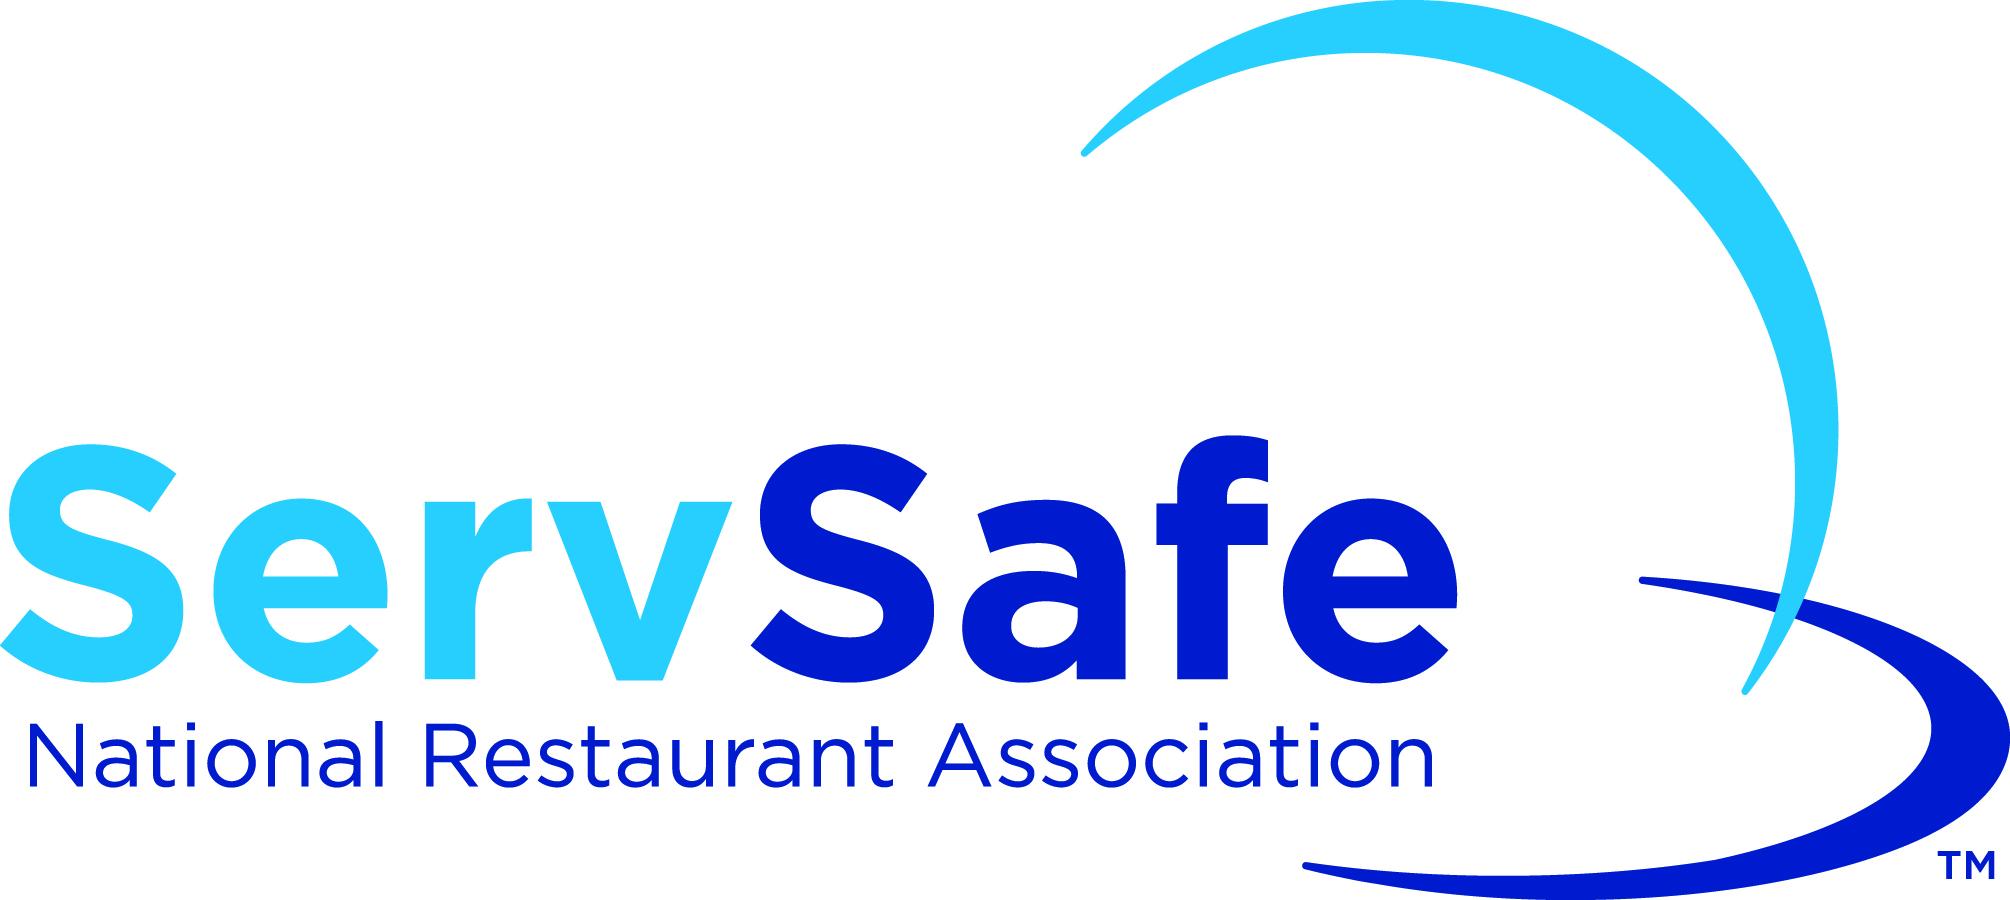 Training | Restaurant Association of Metropolitan Washington